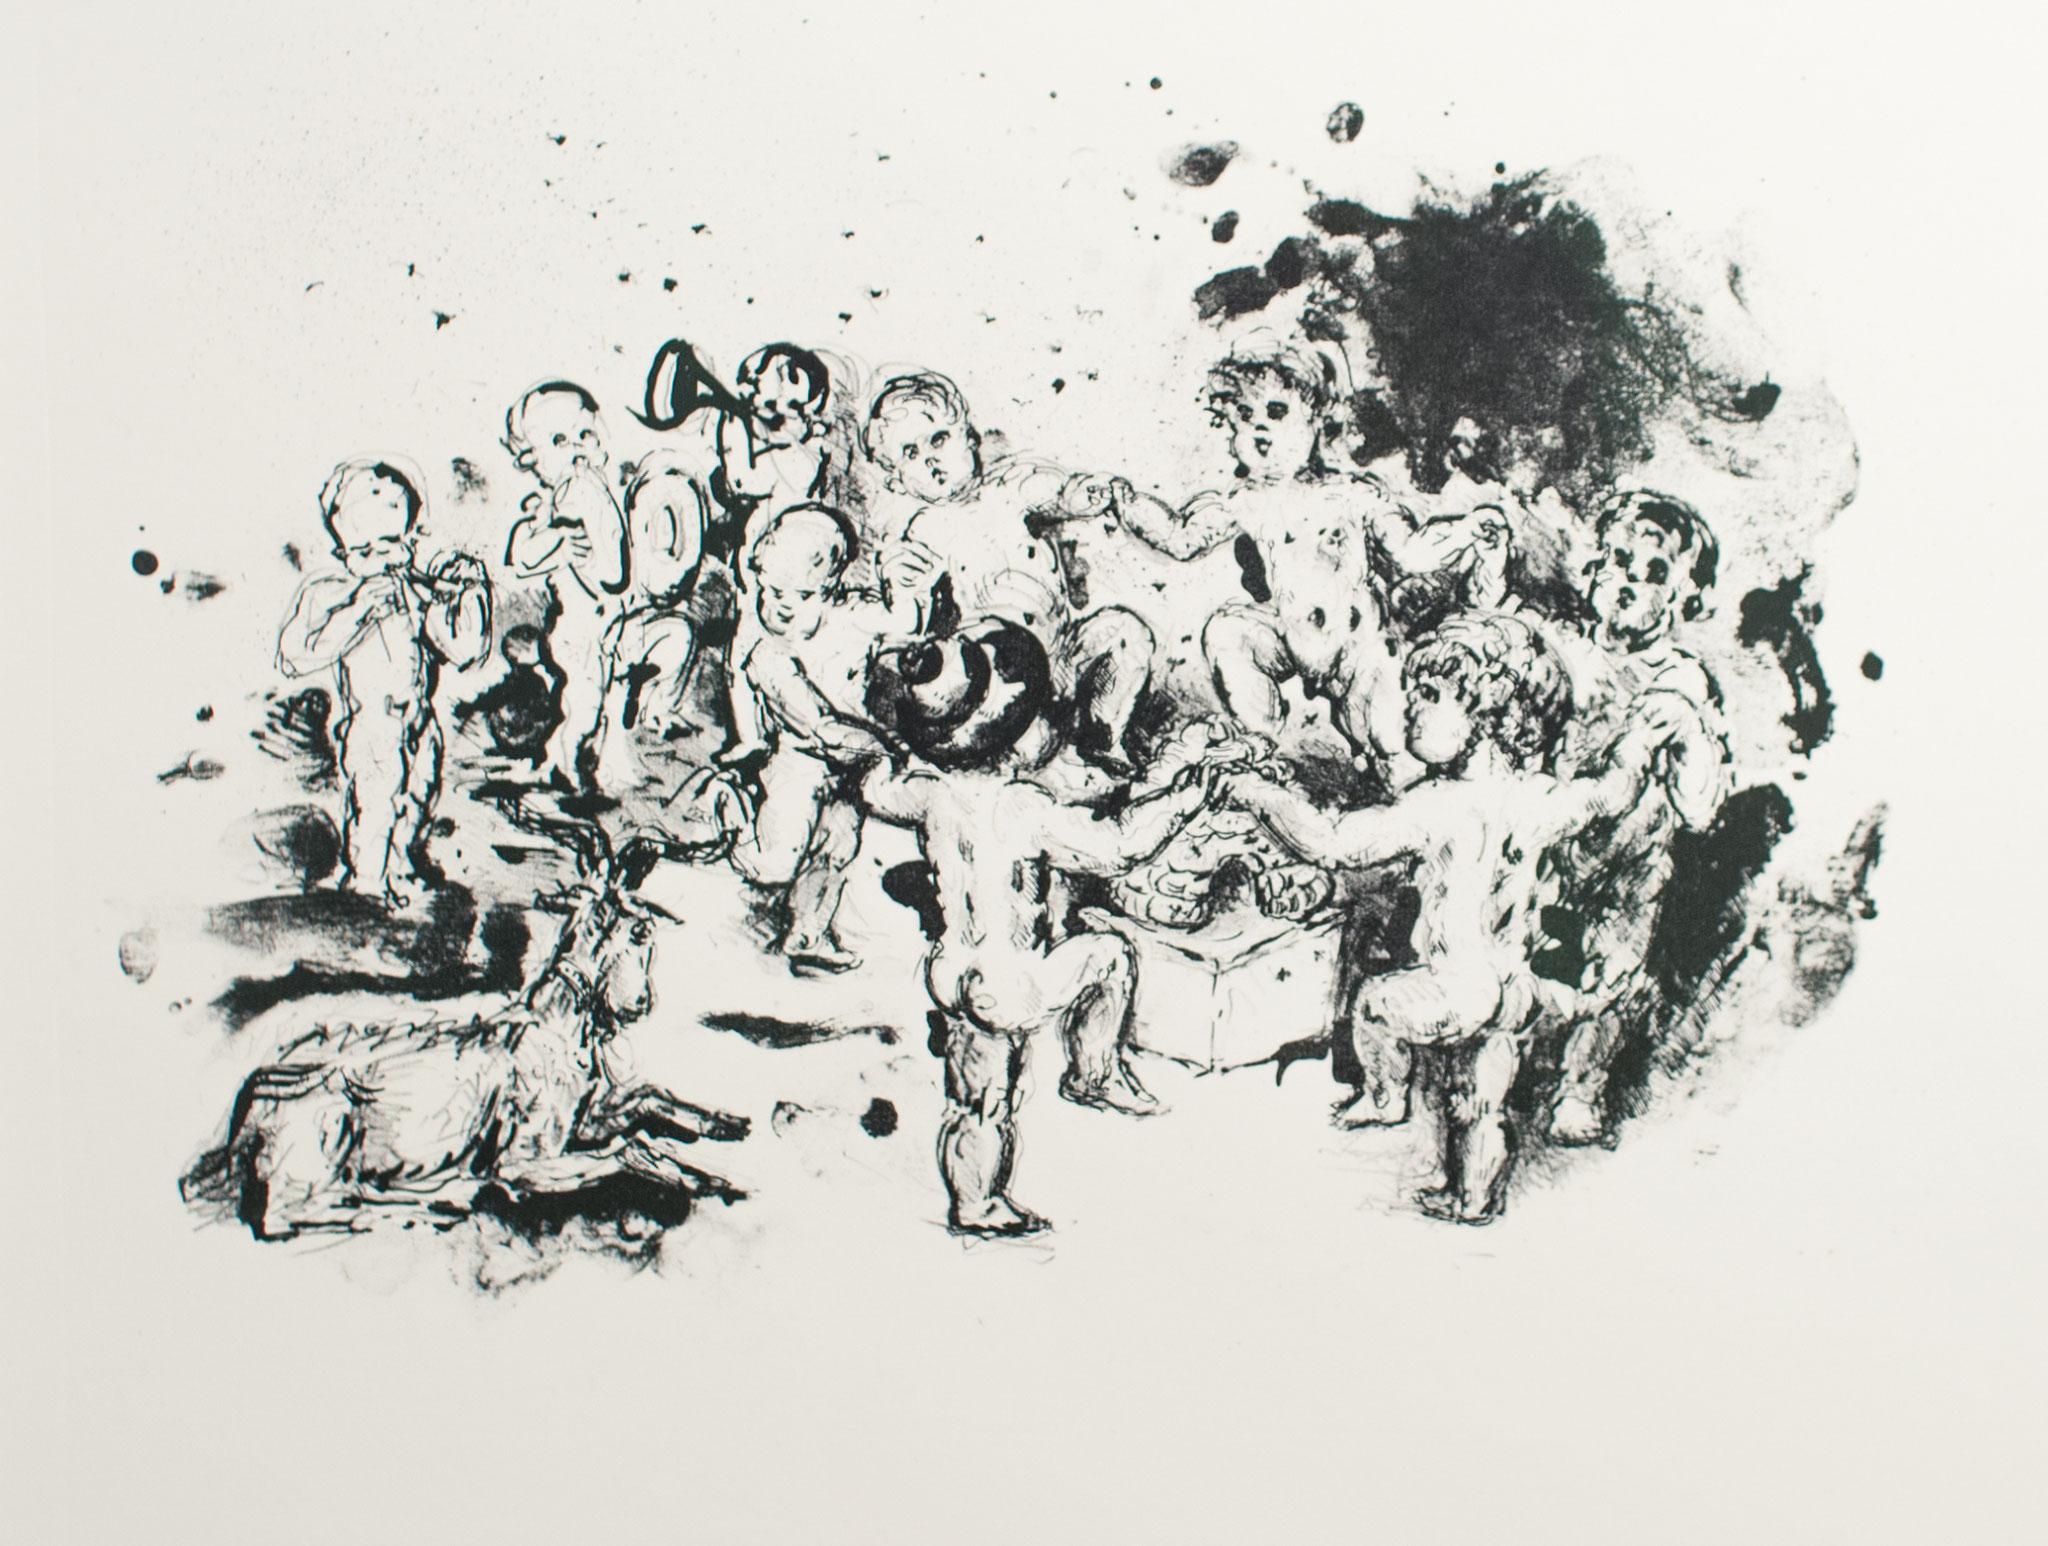 Tanz um den Bienenkorb, 1981, Lithographie, 38cm x 49cm